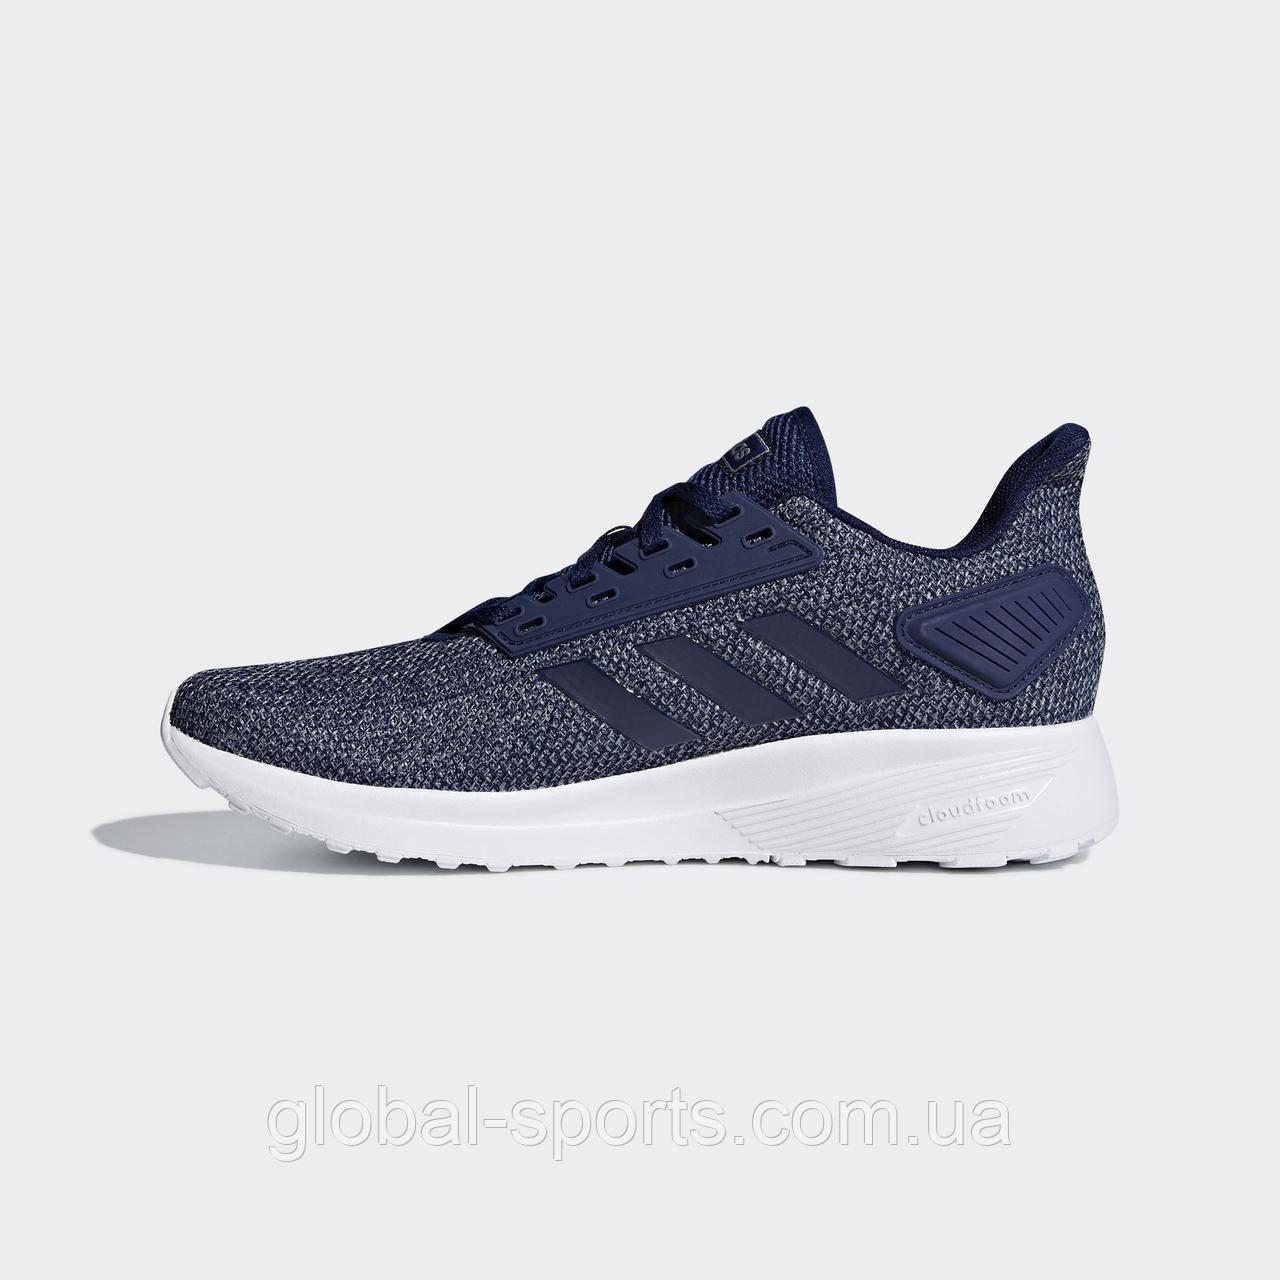 02c55ae9 Мужские кроссовки Adidas Duramo 9(Артикул:F35275): продажа, цена в ...